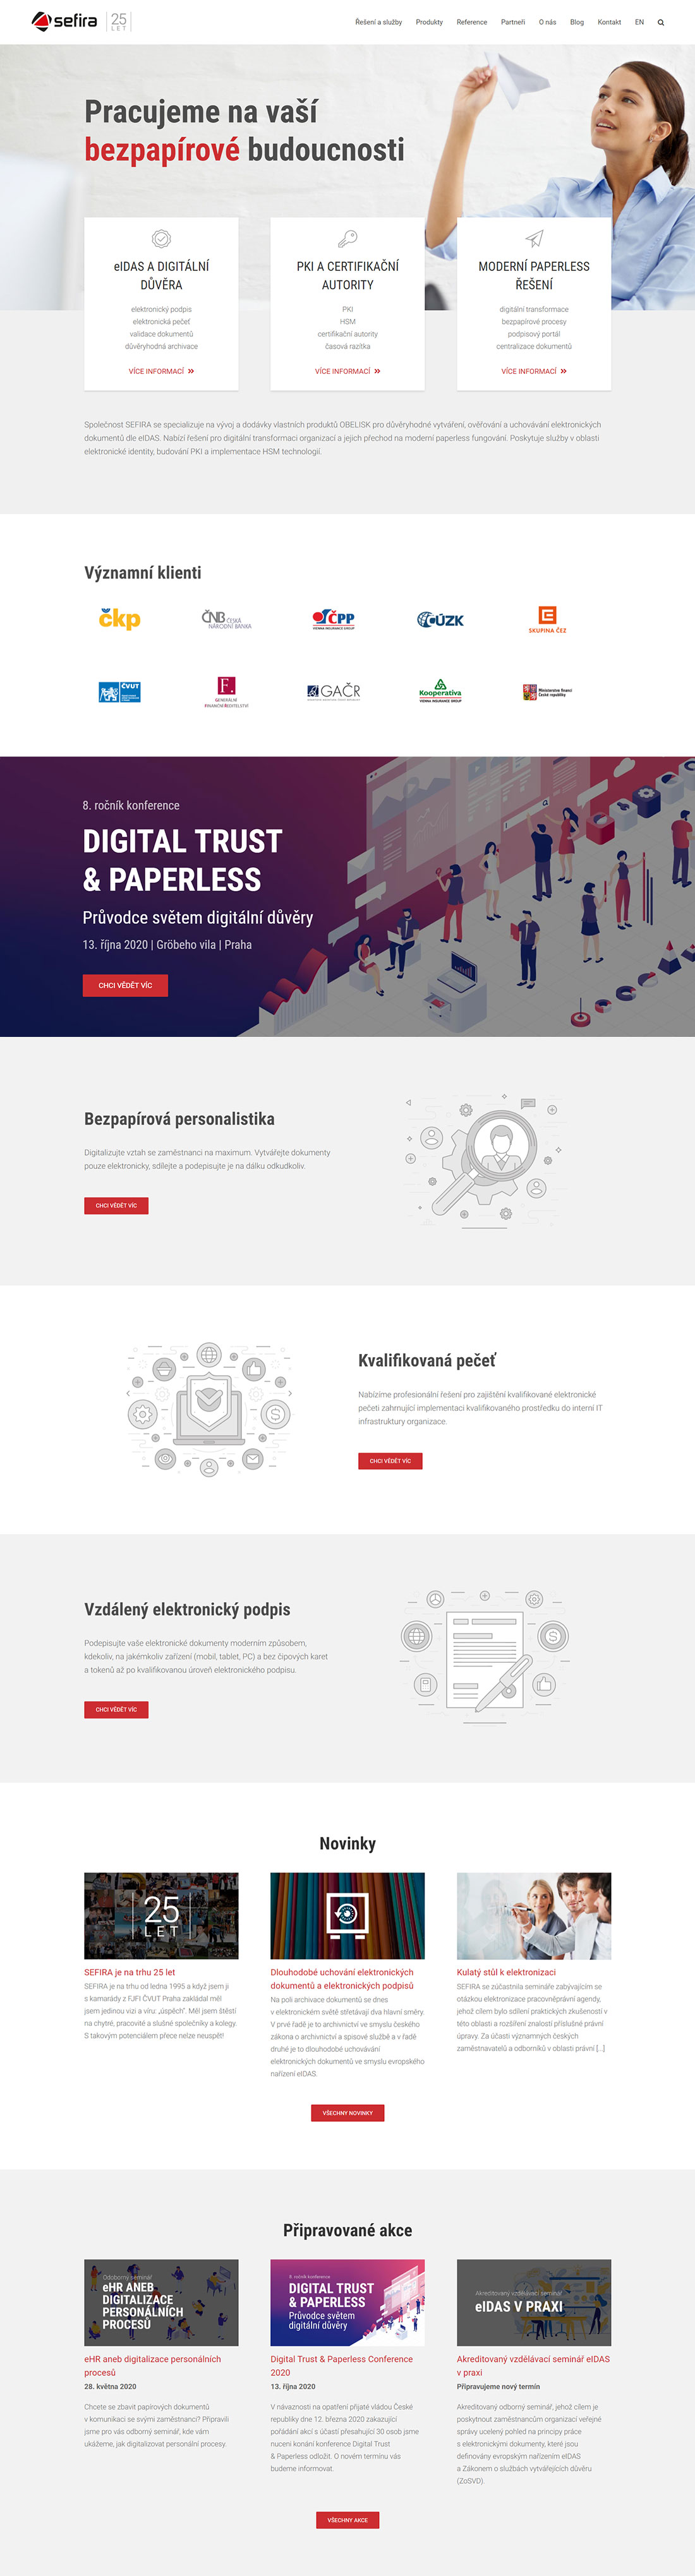 URVIHO - redesign www stránek - homepage